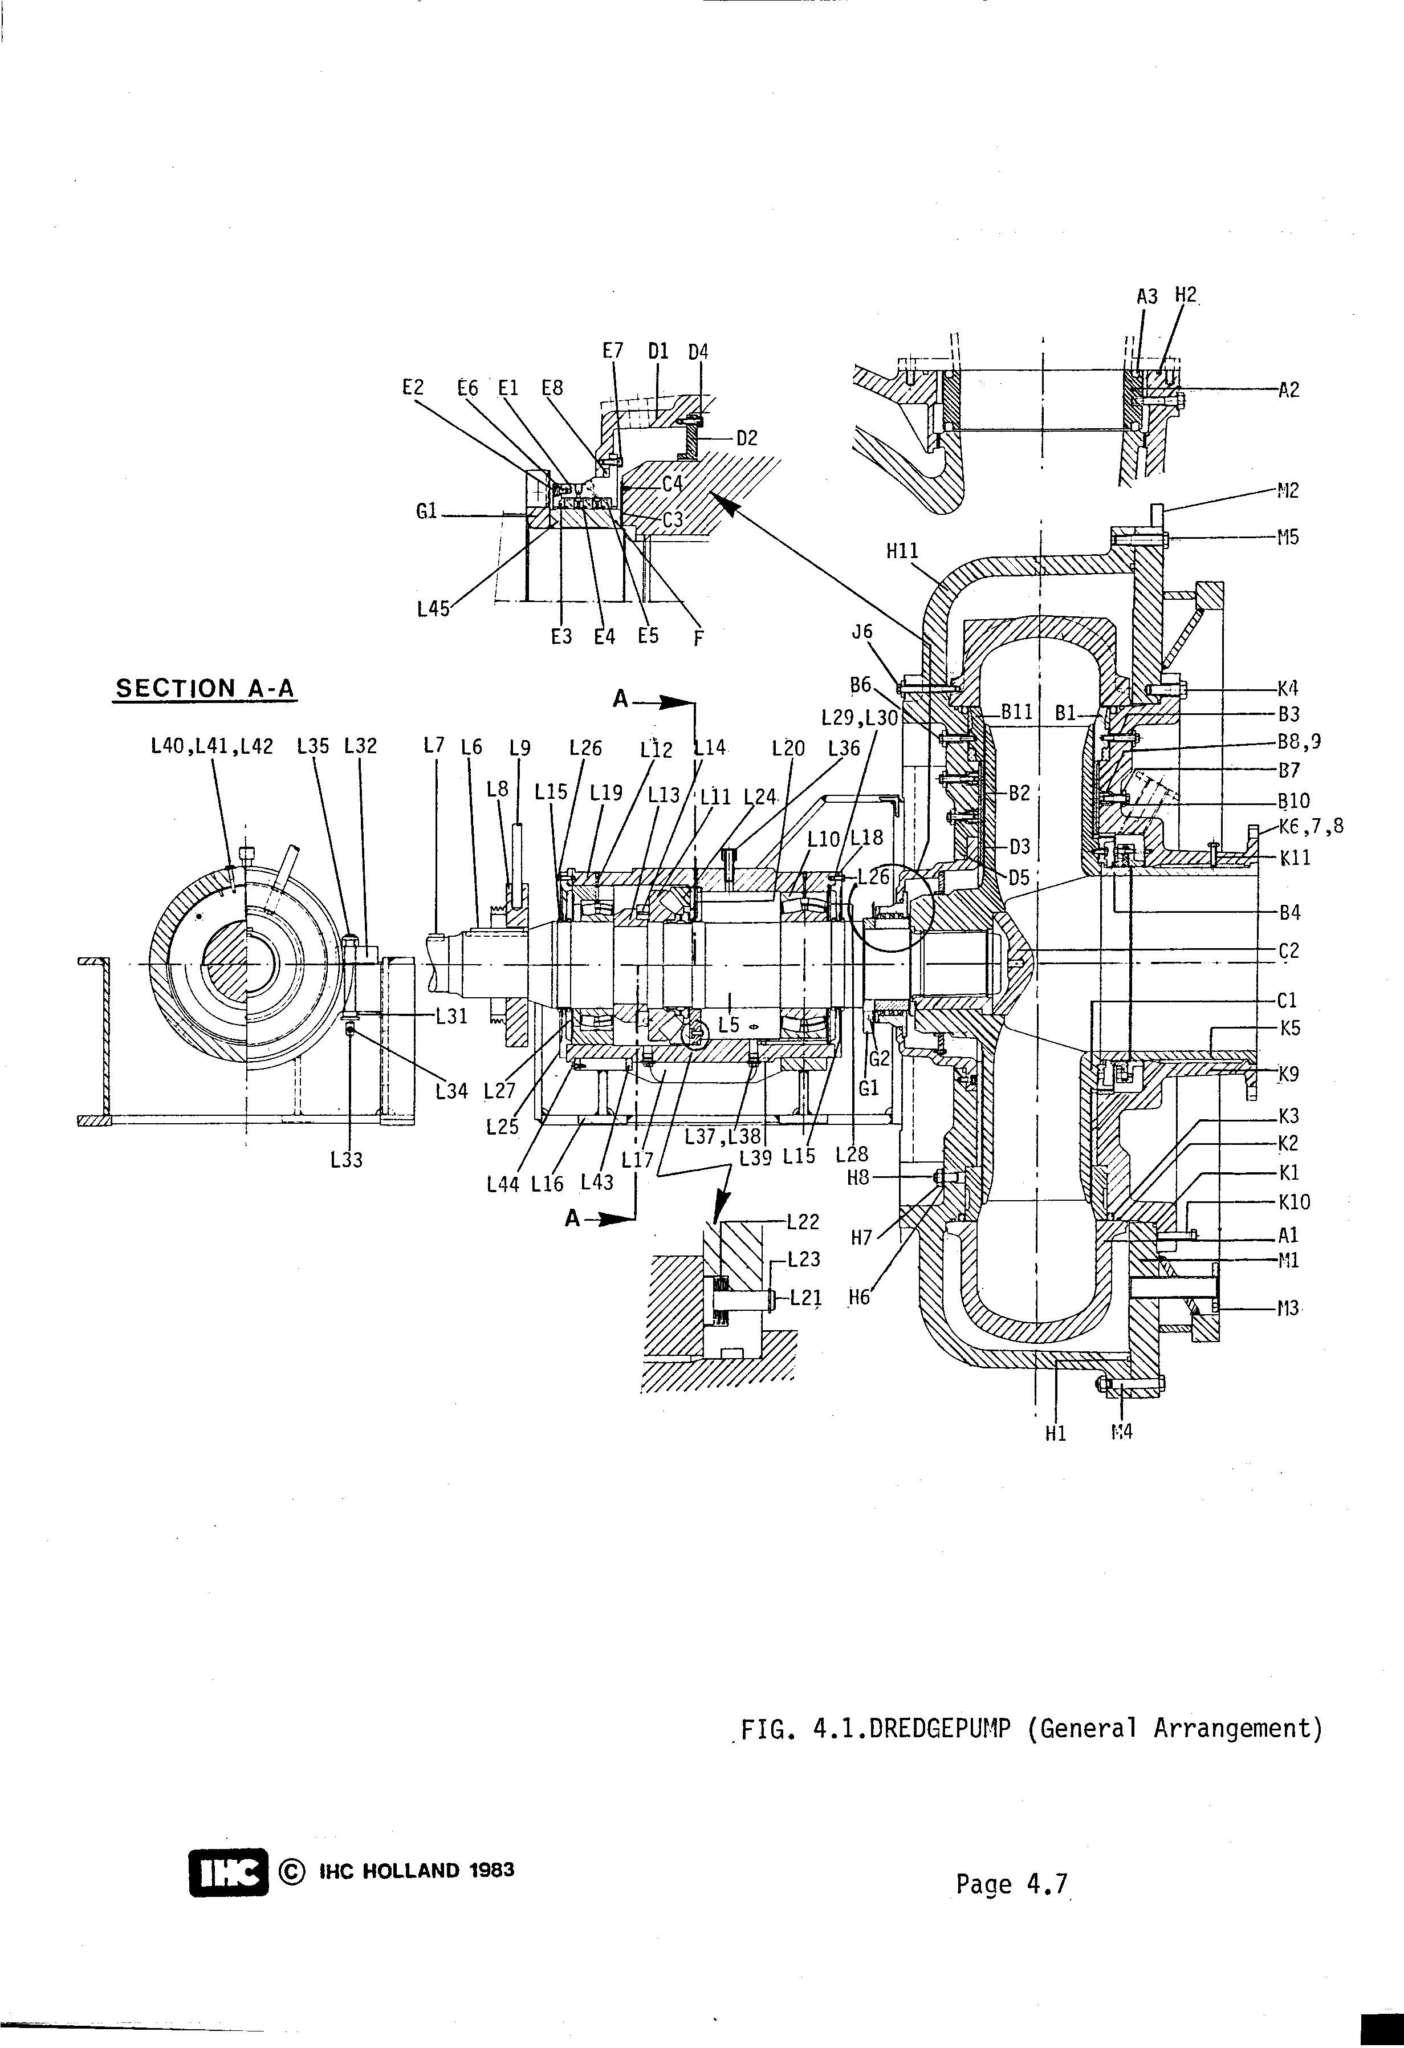 IHC Double wall pump